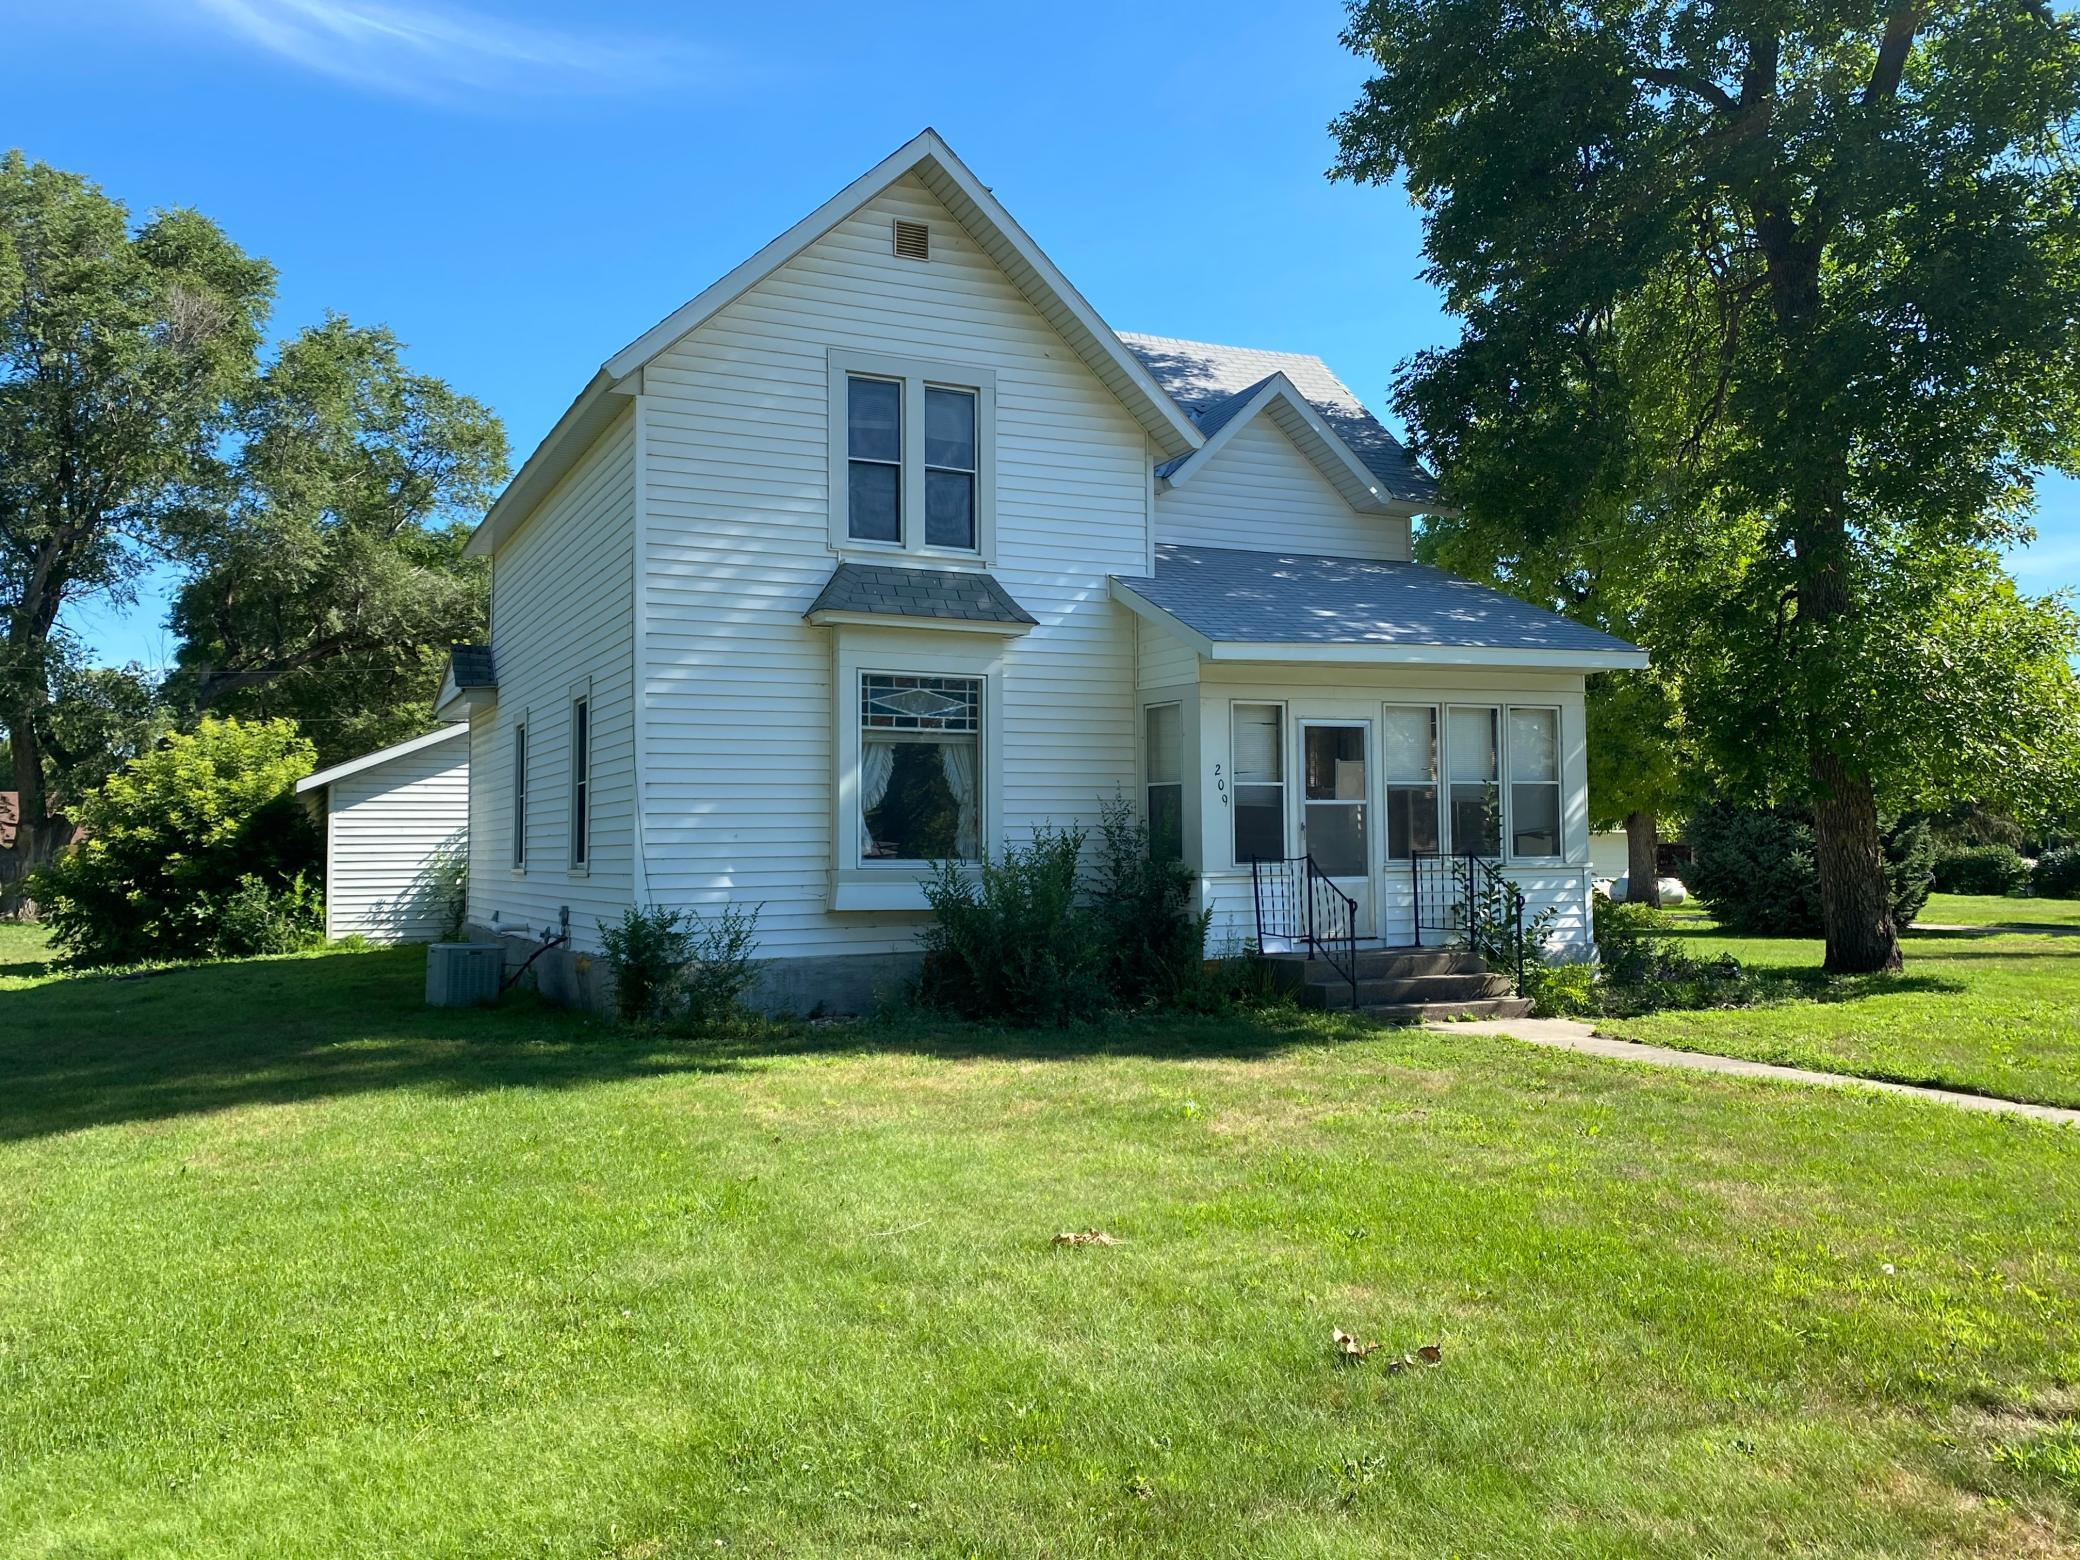 209 1st Avenue Property Photo - Bellingham, MN real estate listing